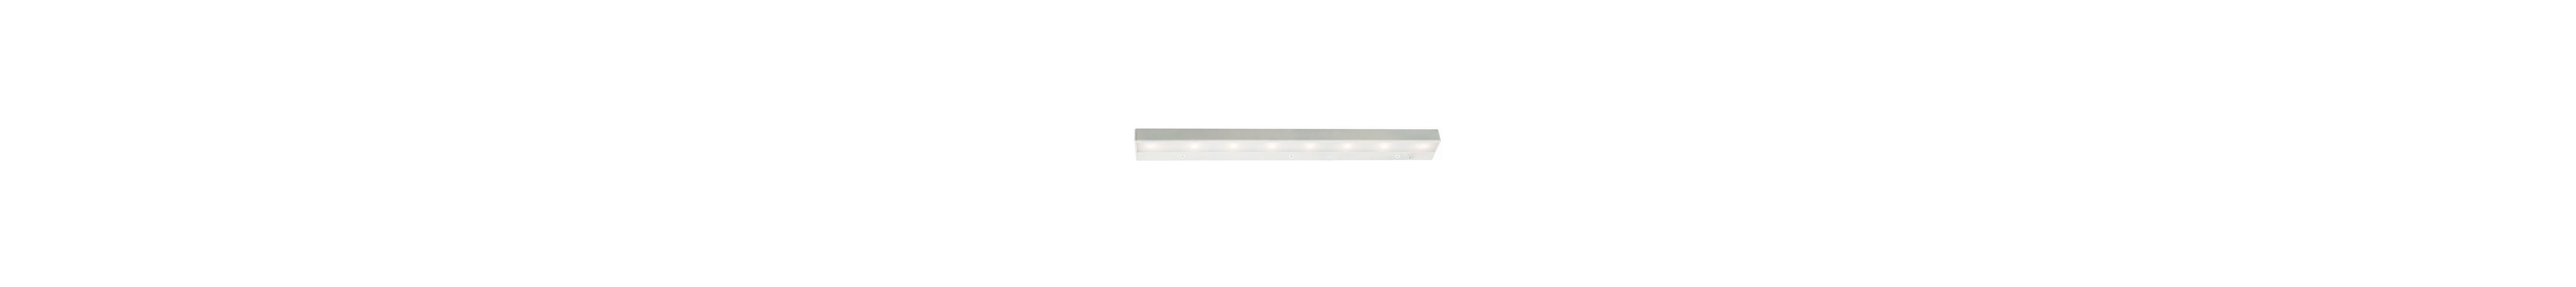 "WAC Lighting BA-LED8-27 24"" Length 2700K High Output LED Under Cabinet"